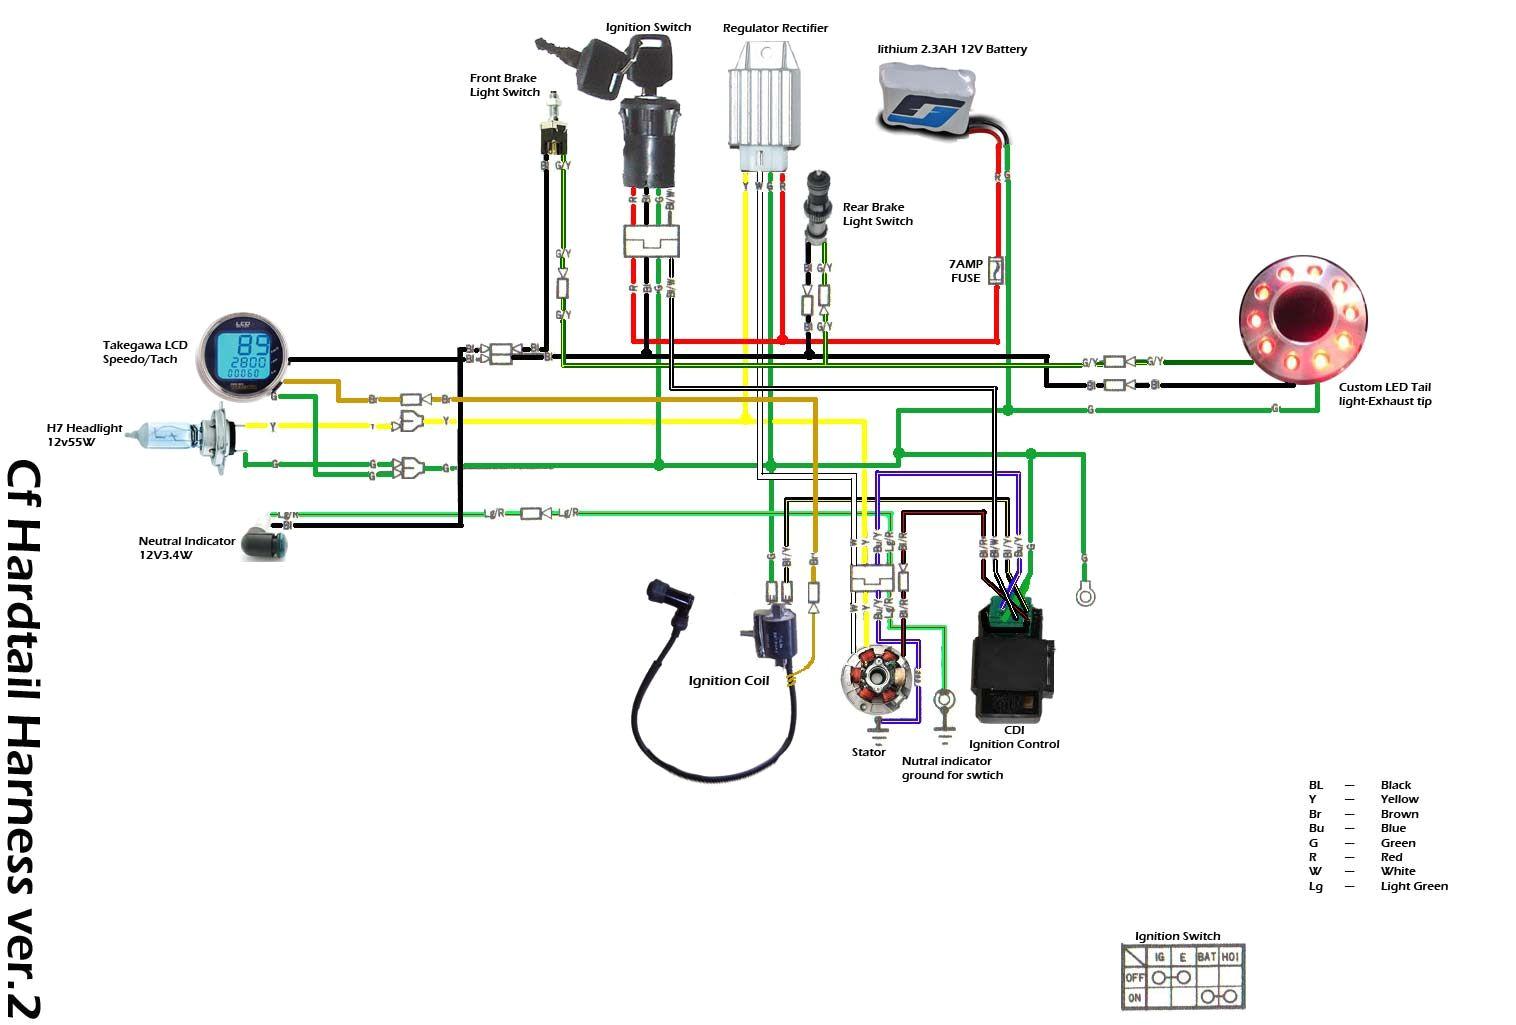 lifan 110cc atv wiring diagram wiring diagram for you 110 atv wiring diagram 2001